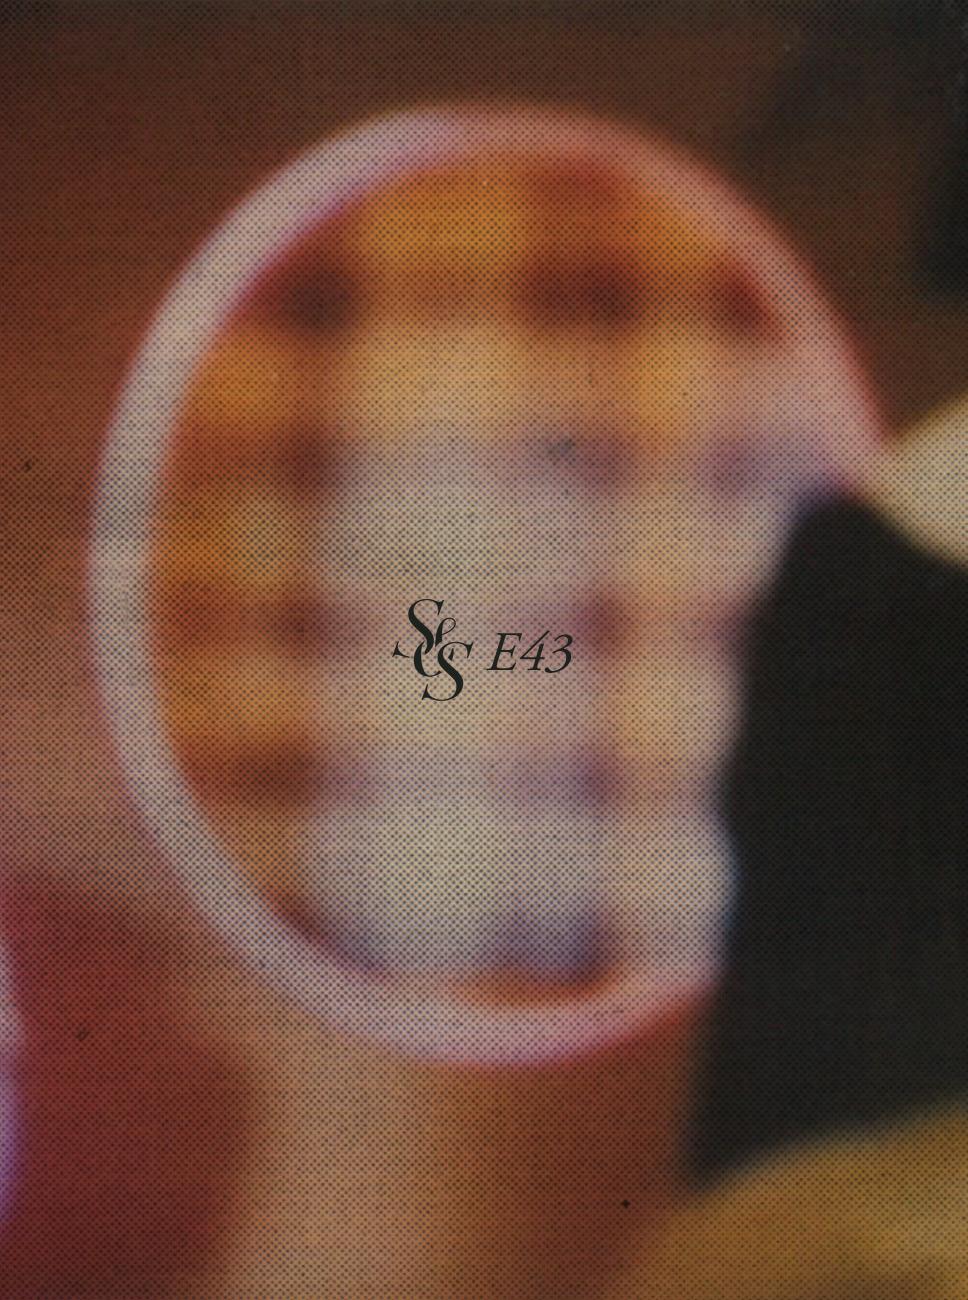 S&S-NewtownRadio-E43